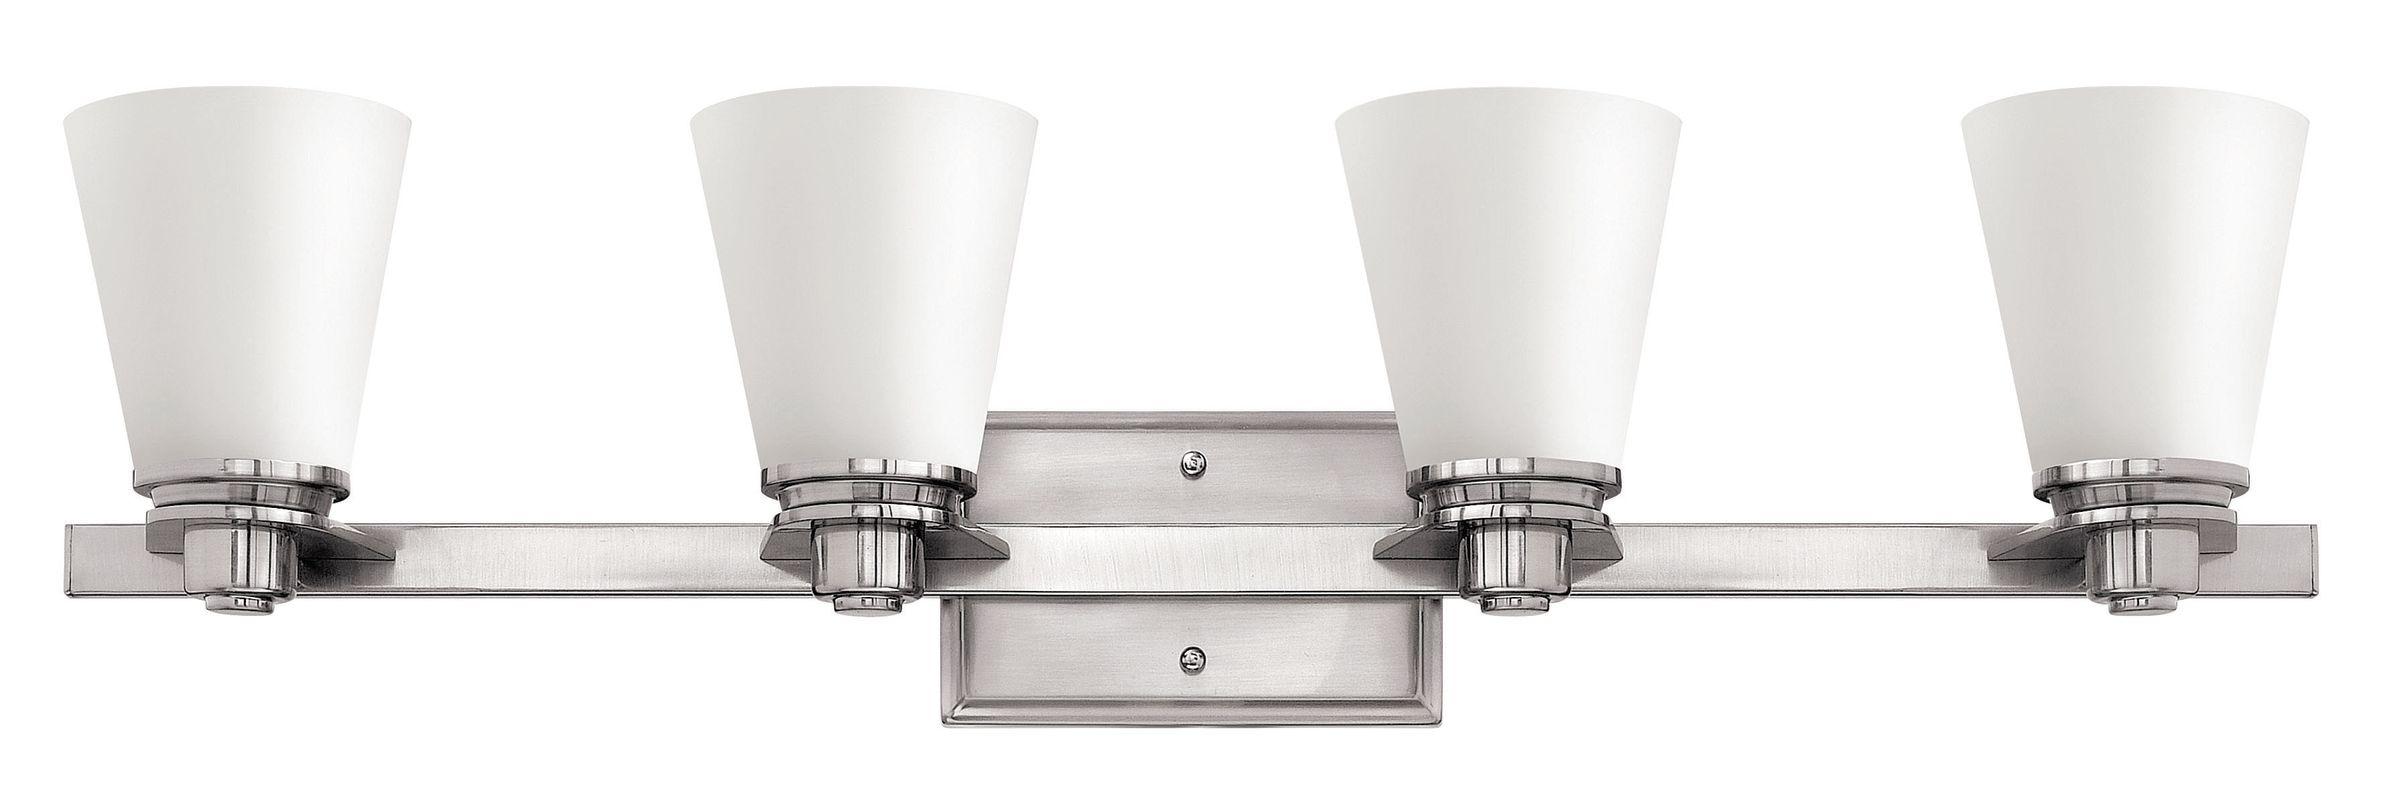 Progress Lighting Calven Collection 4 Light Brushed Nickel: Hinkley Lighting 5554BN-GU24 Brushed Nickel 4 Light Title